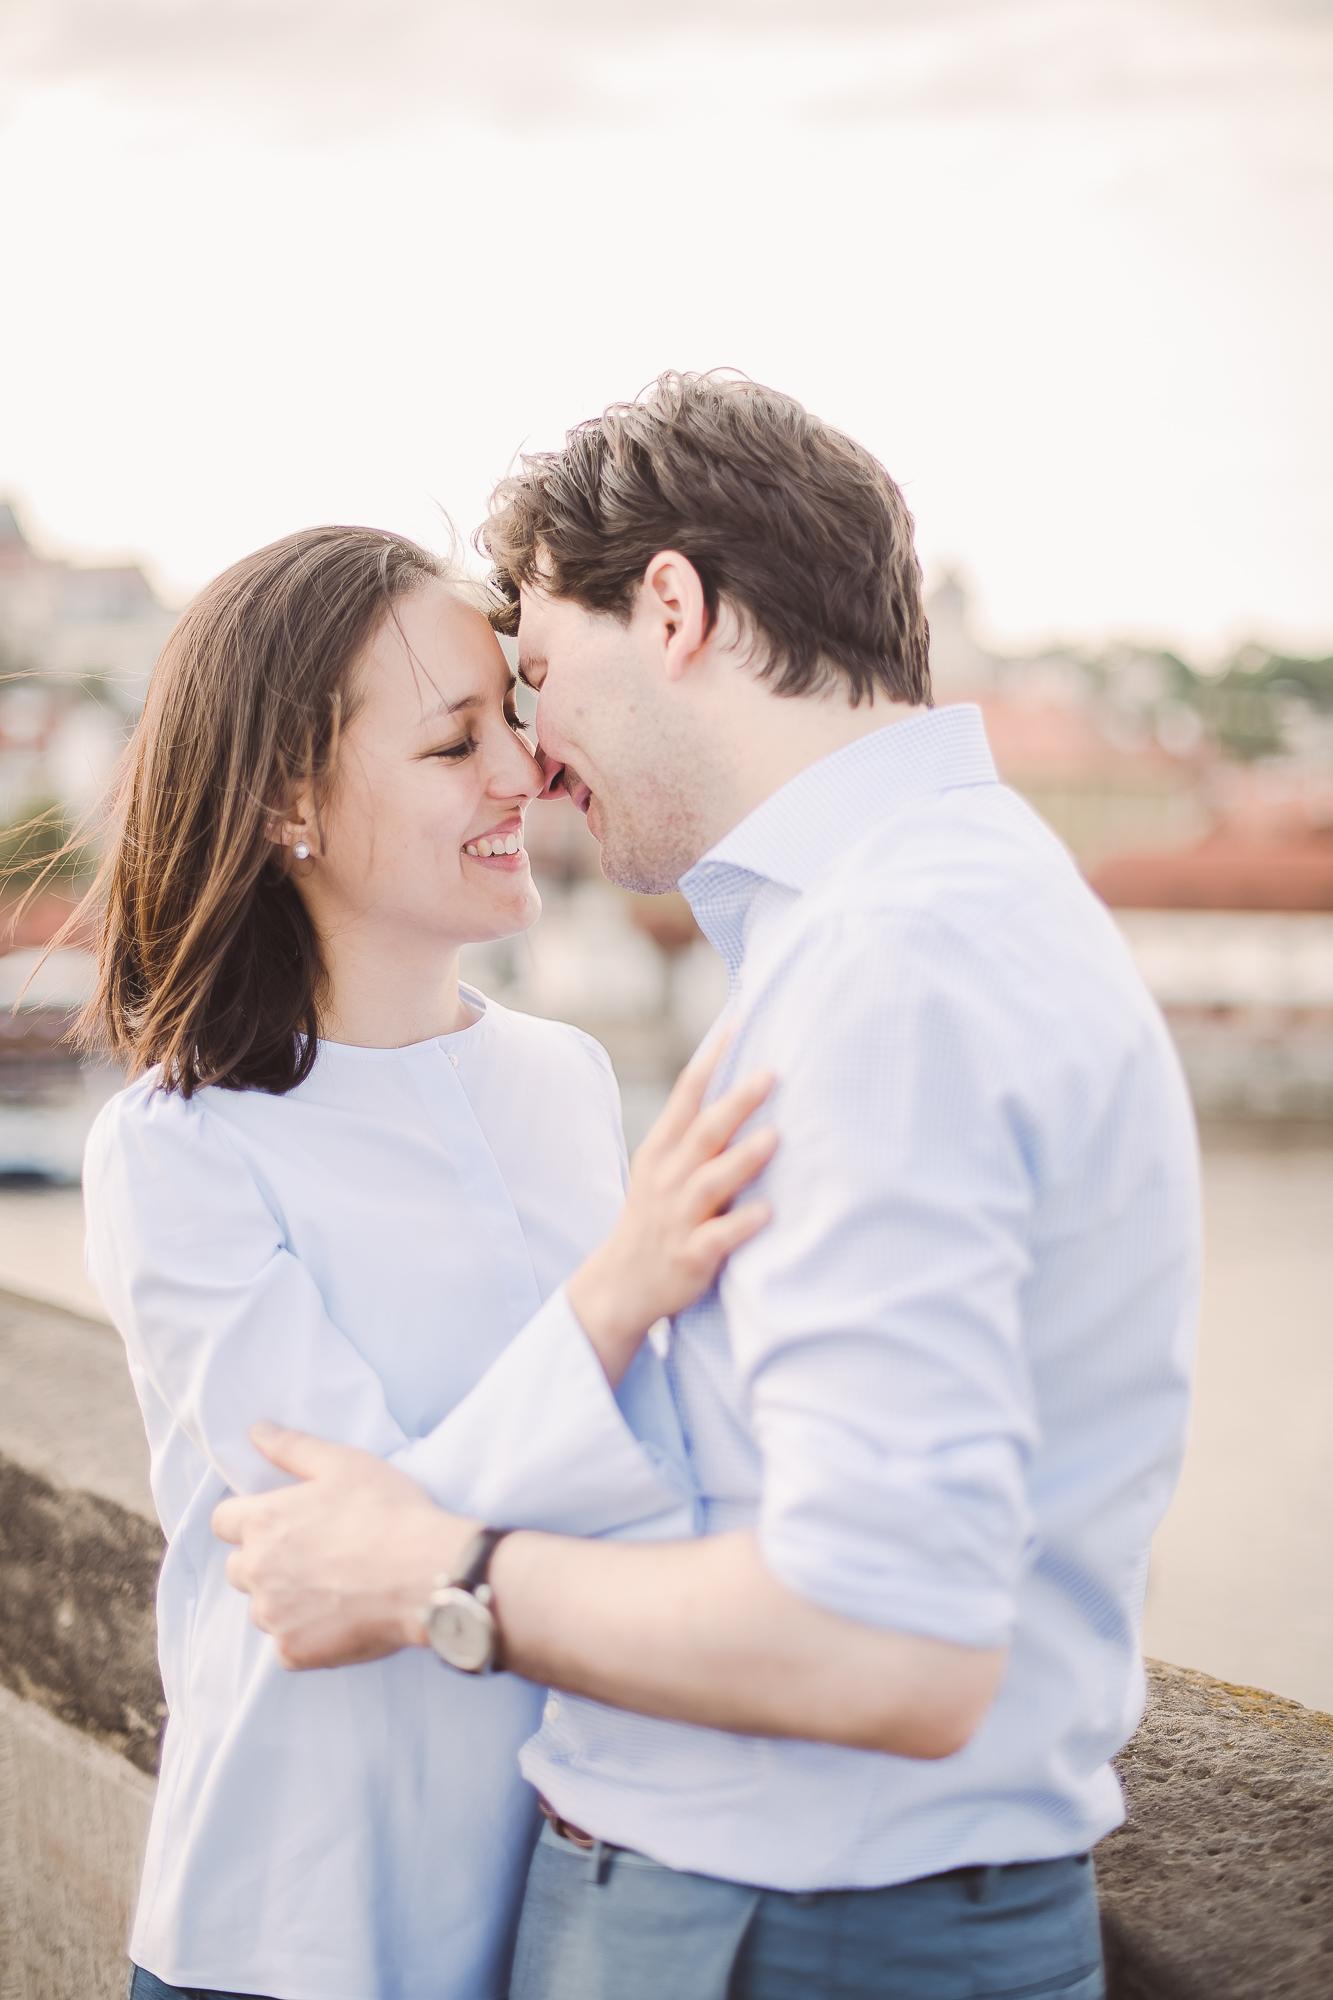 Prague-Wedding-Photography-Matej-Trasak-Engagement-SD-13.jpg